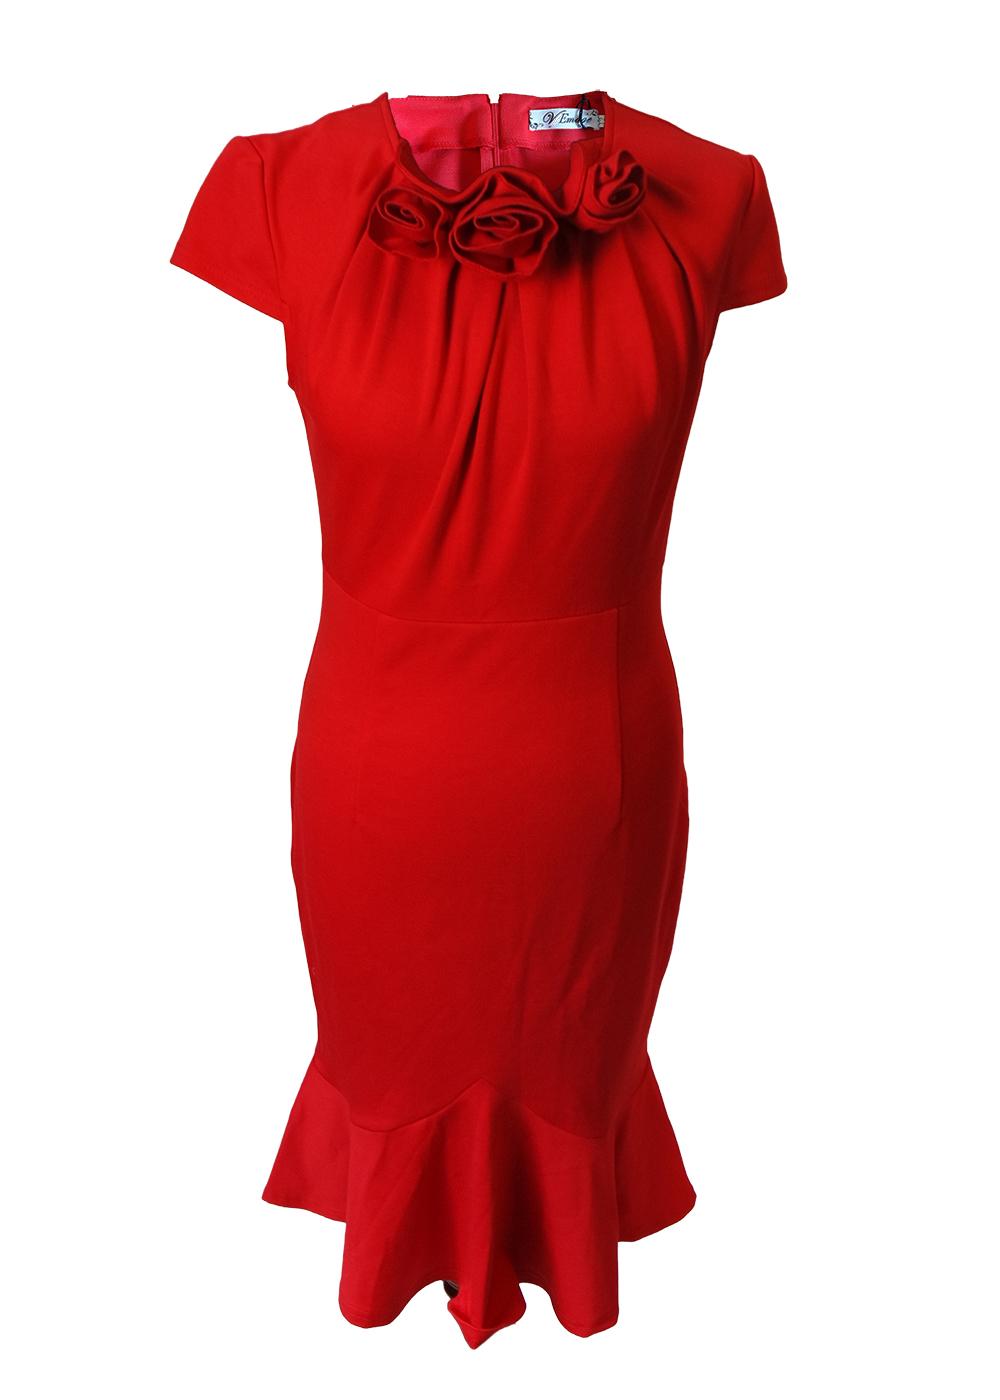 Rotes Midi Kleid mit Rosen Gr. 38 | Etui Kleider ...